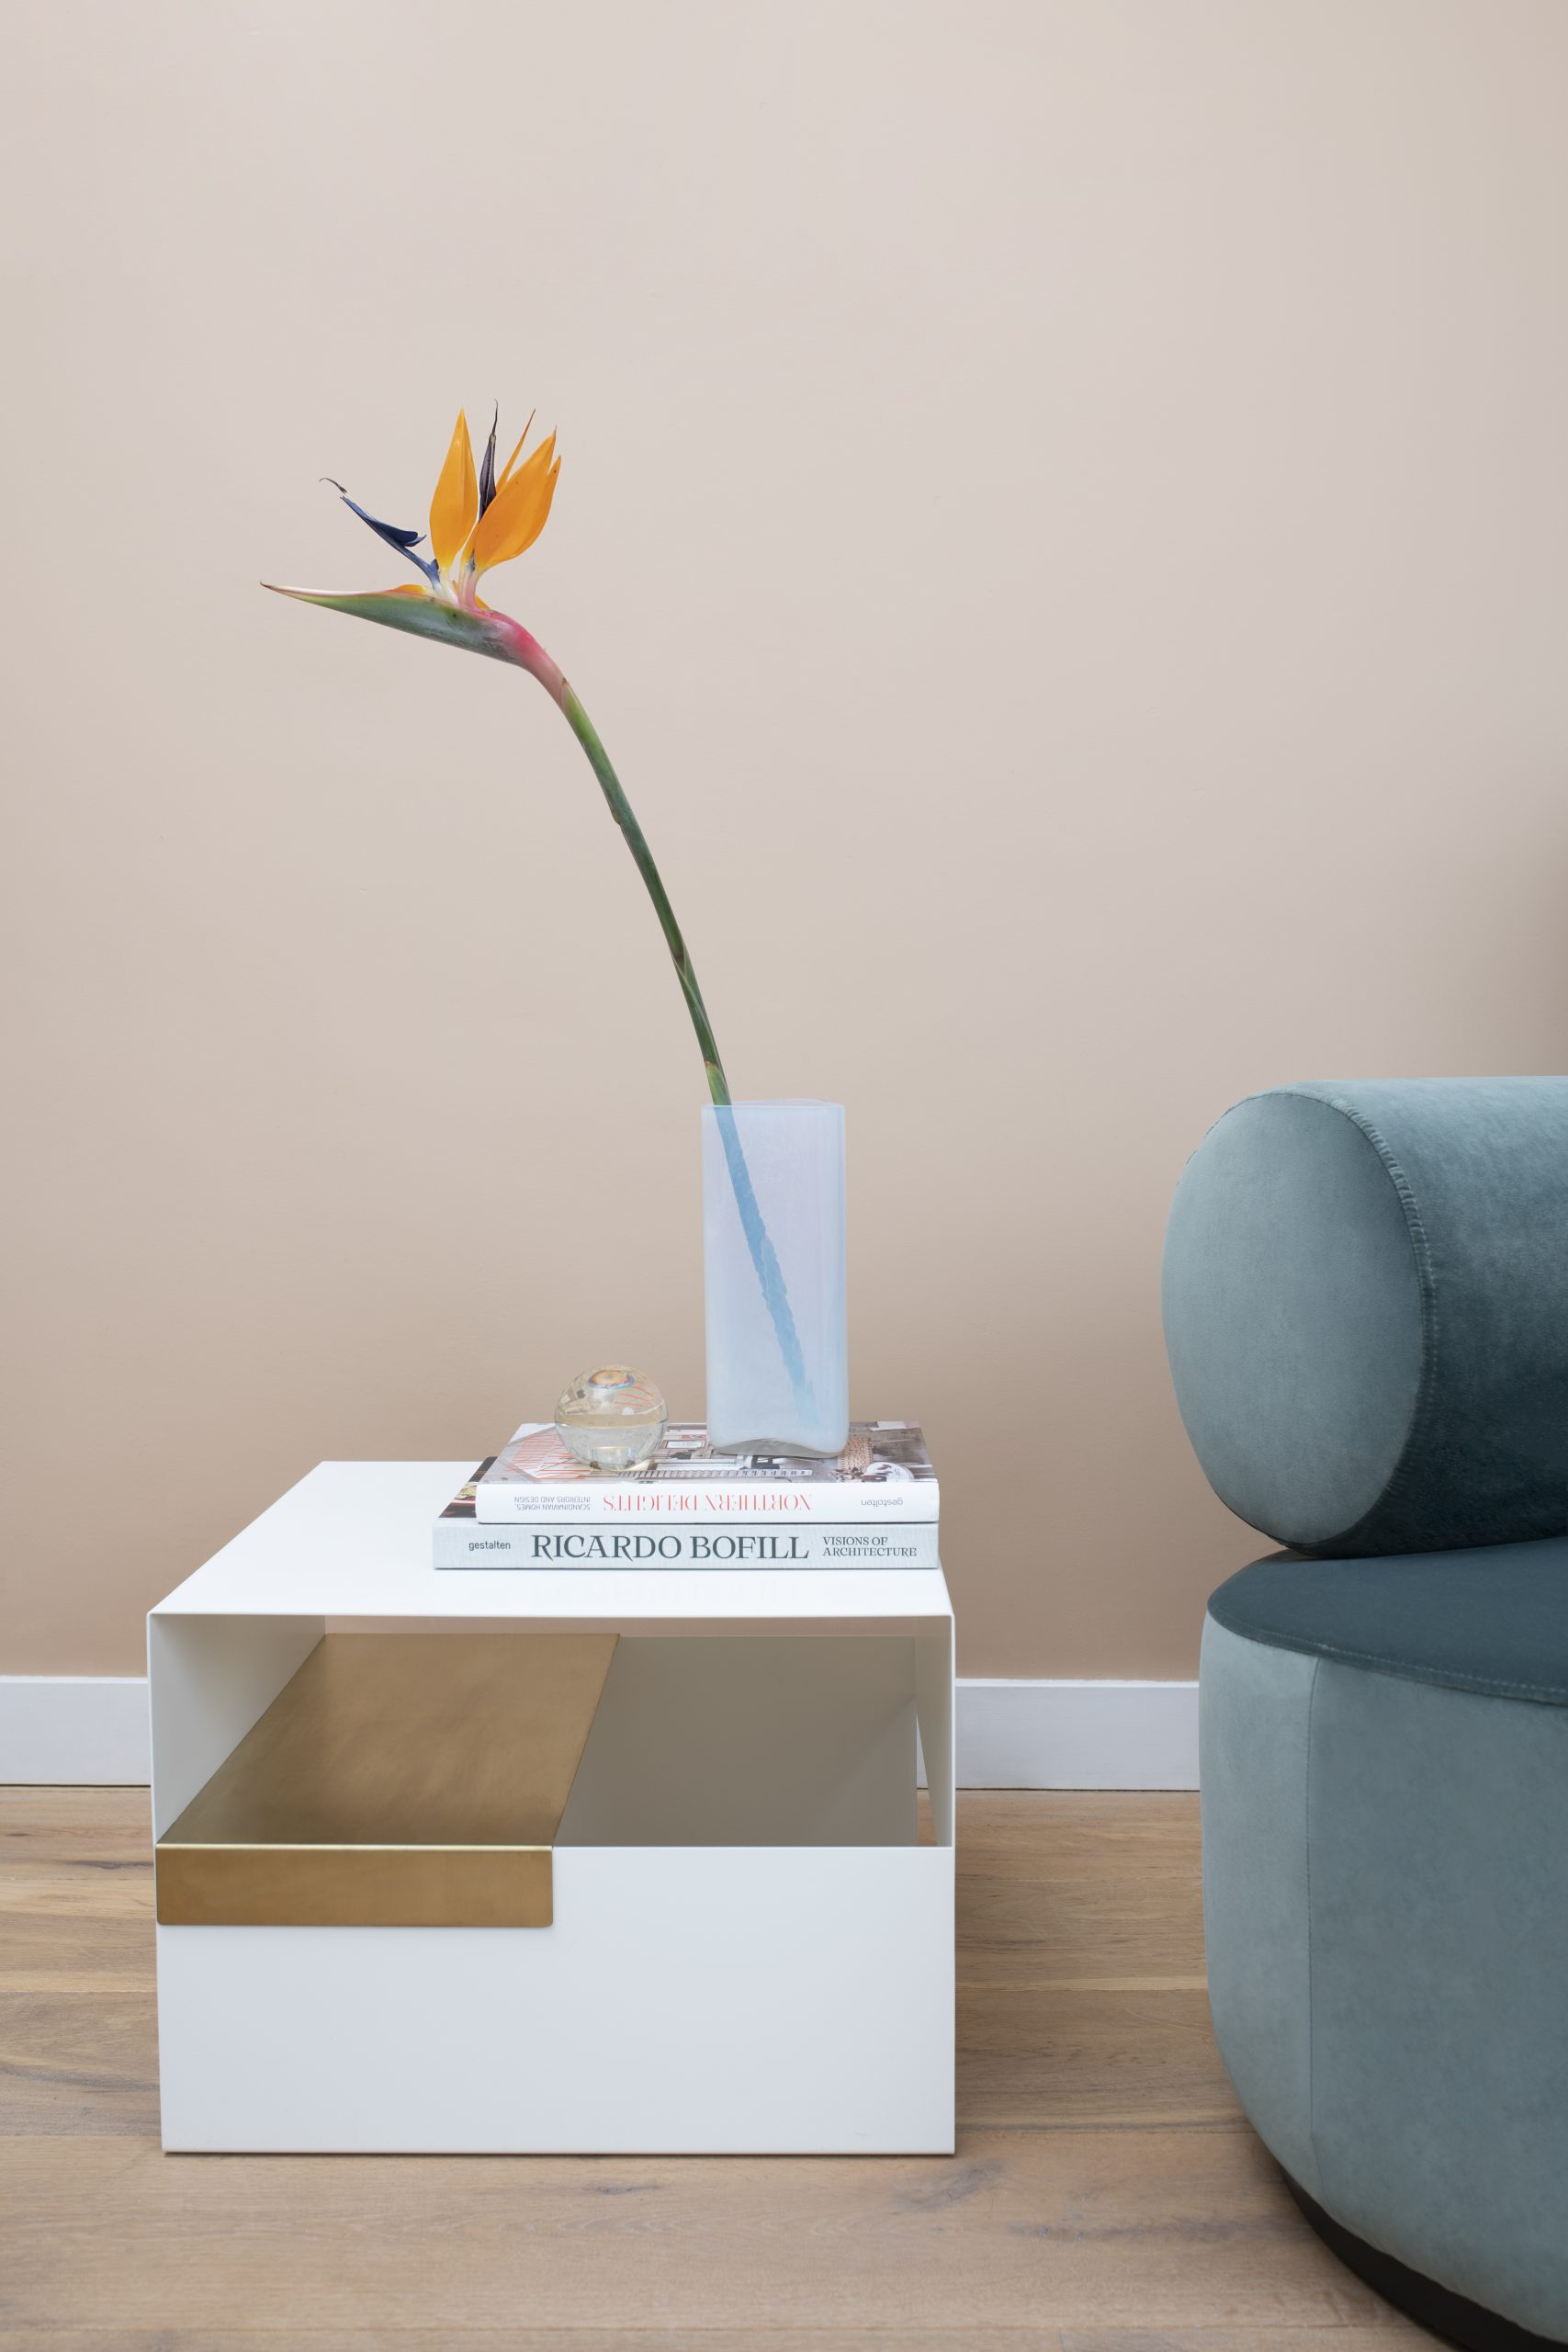 Bruce_vase_axe_coffee_table_Sinclair_lounge_chair